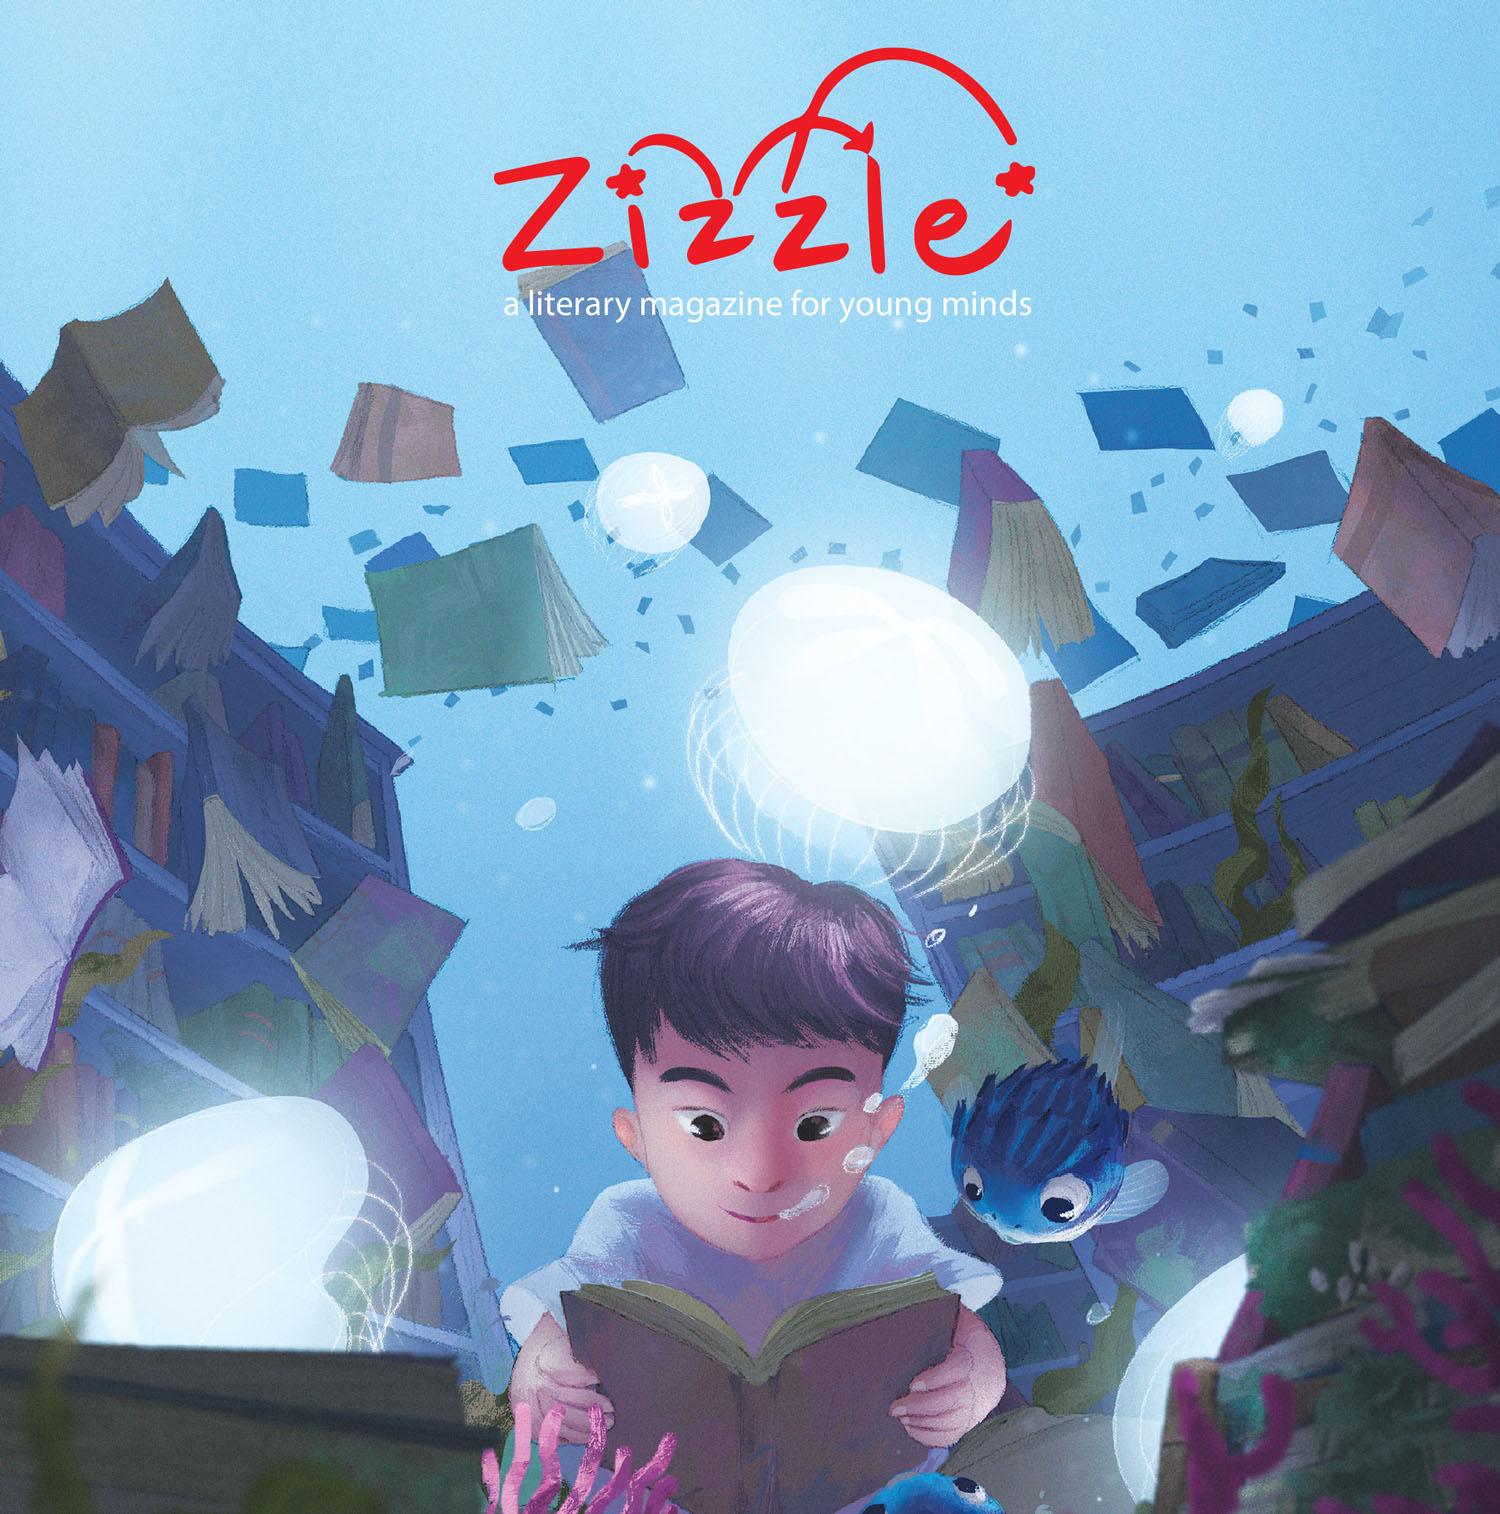 Zizzle Magazine